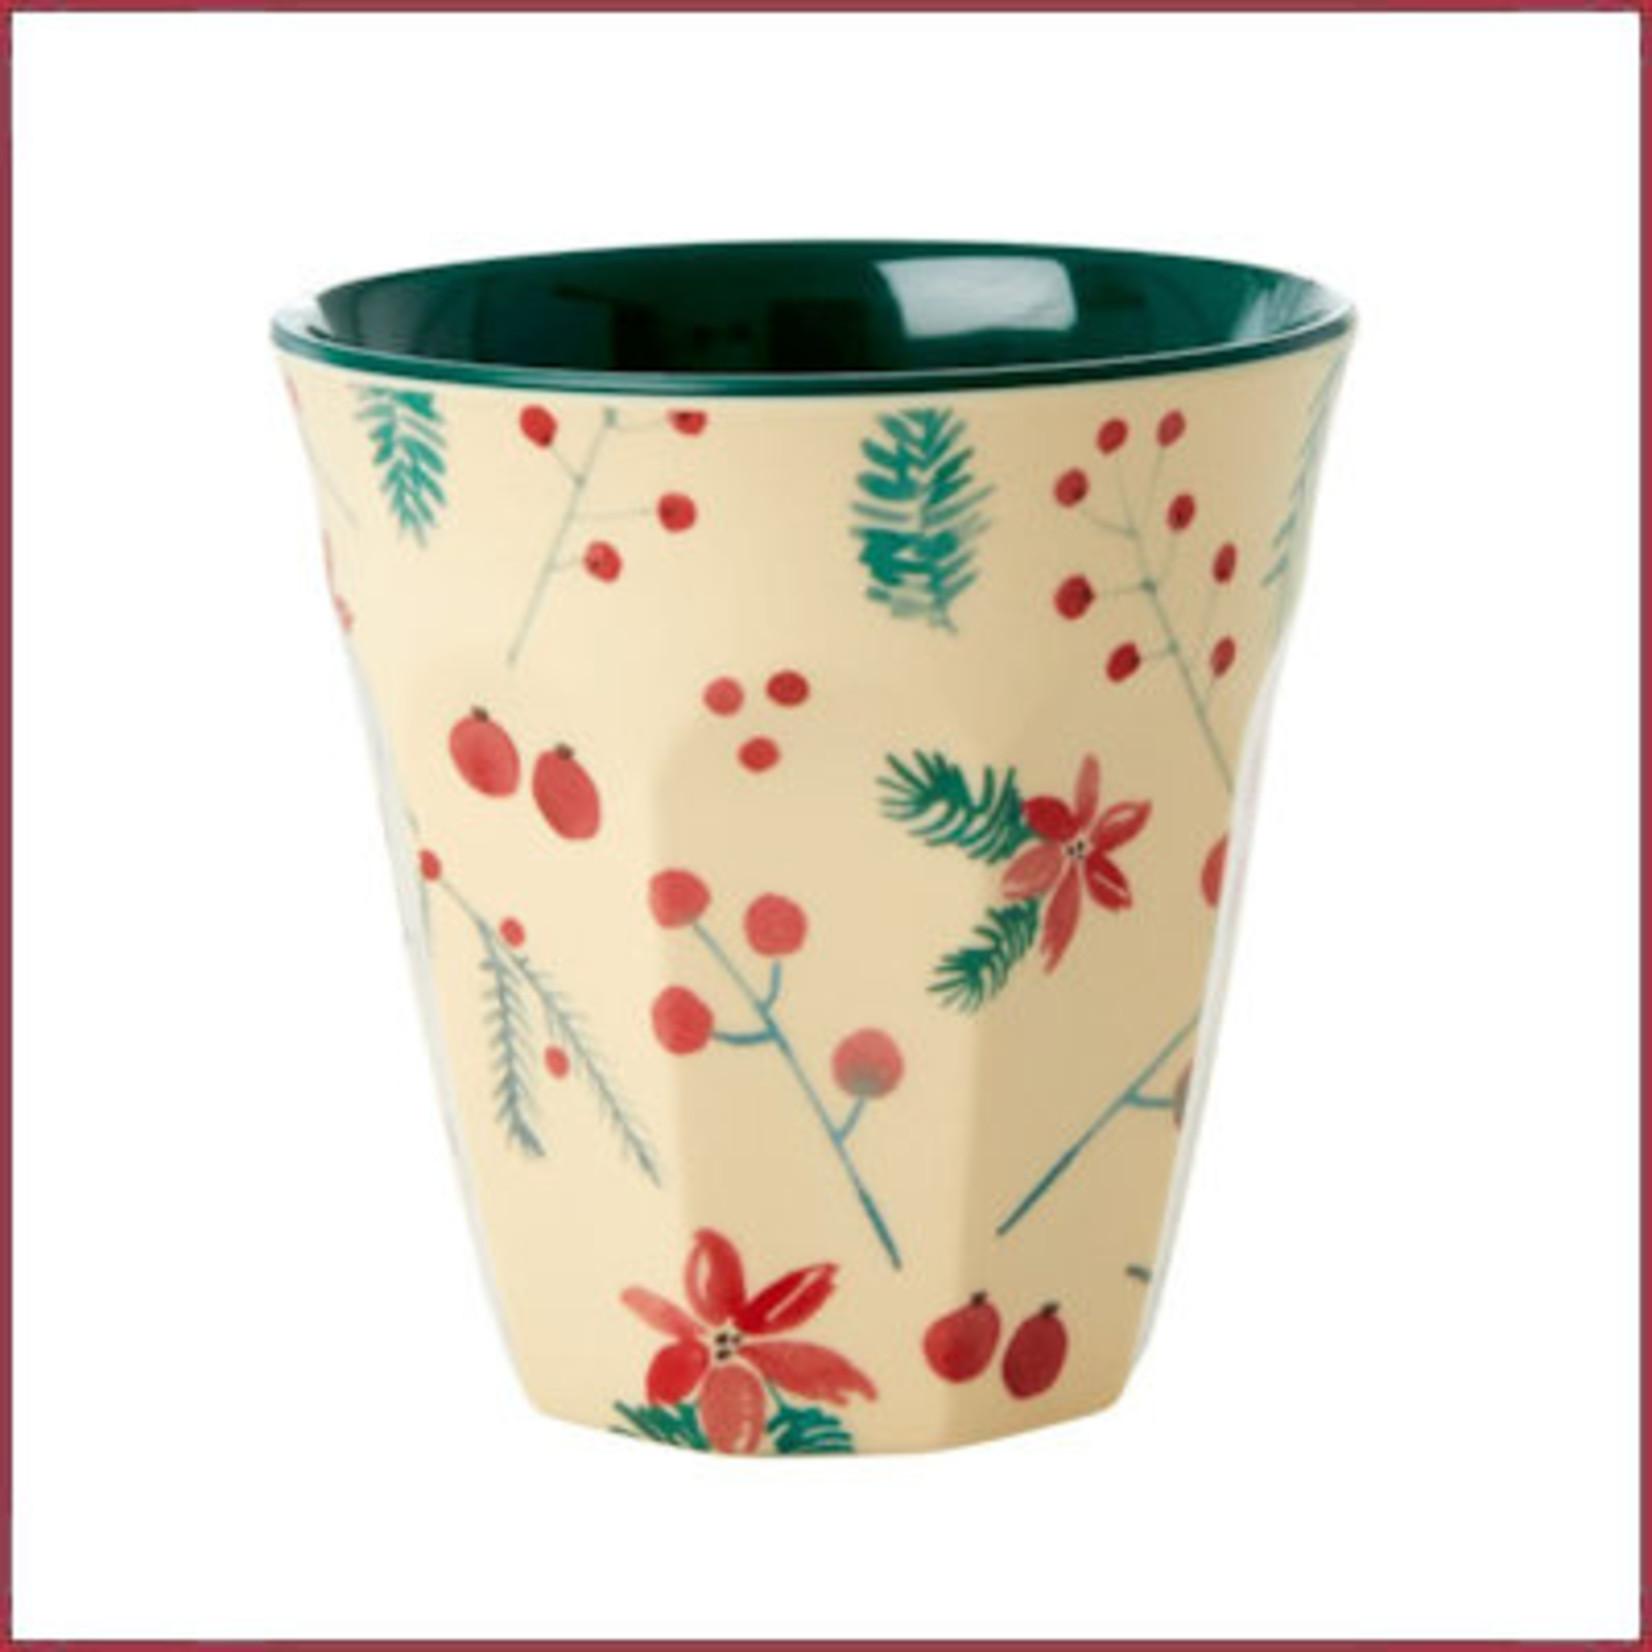 Rice Rice melamine beker met Poinsettia Kerstmis print - two tone - medium